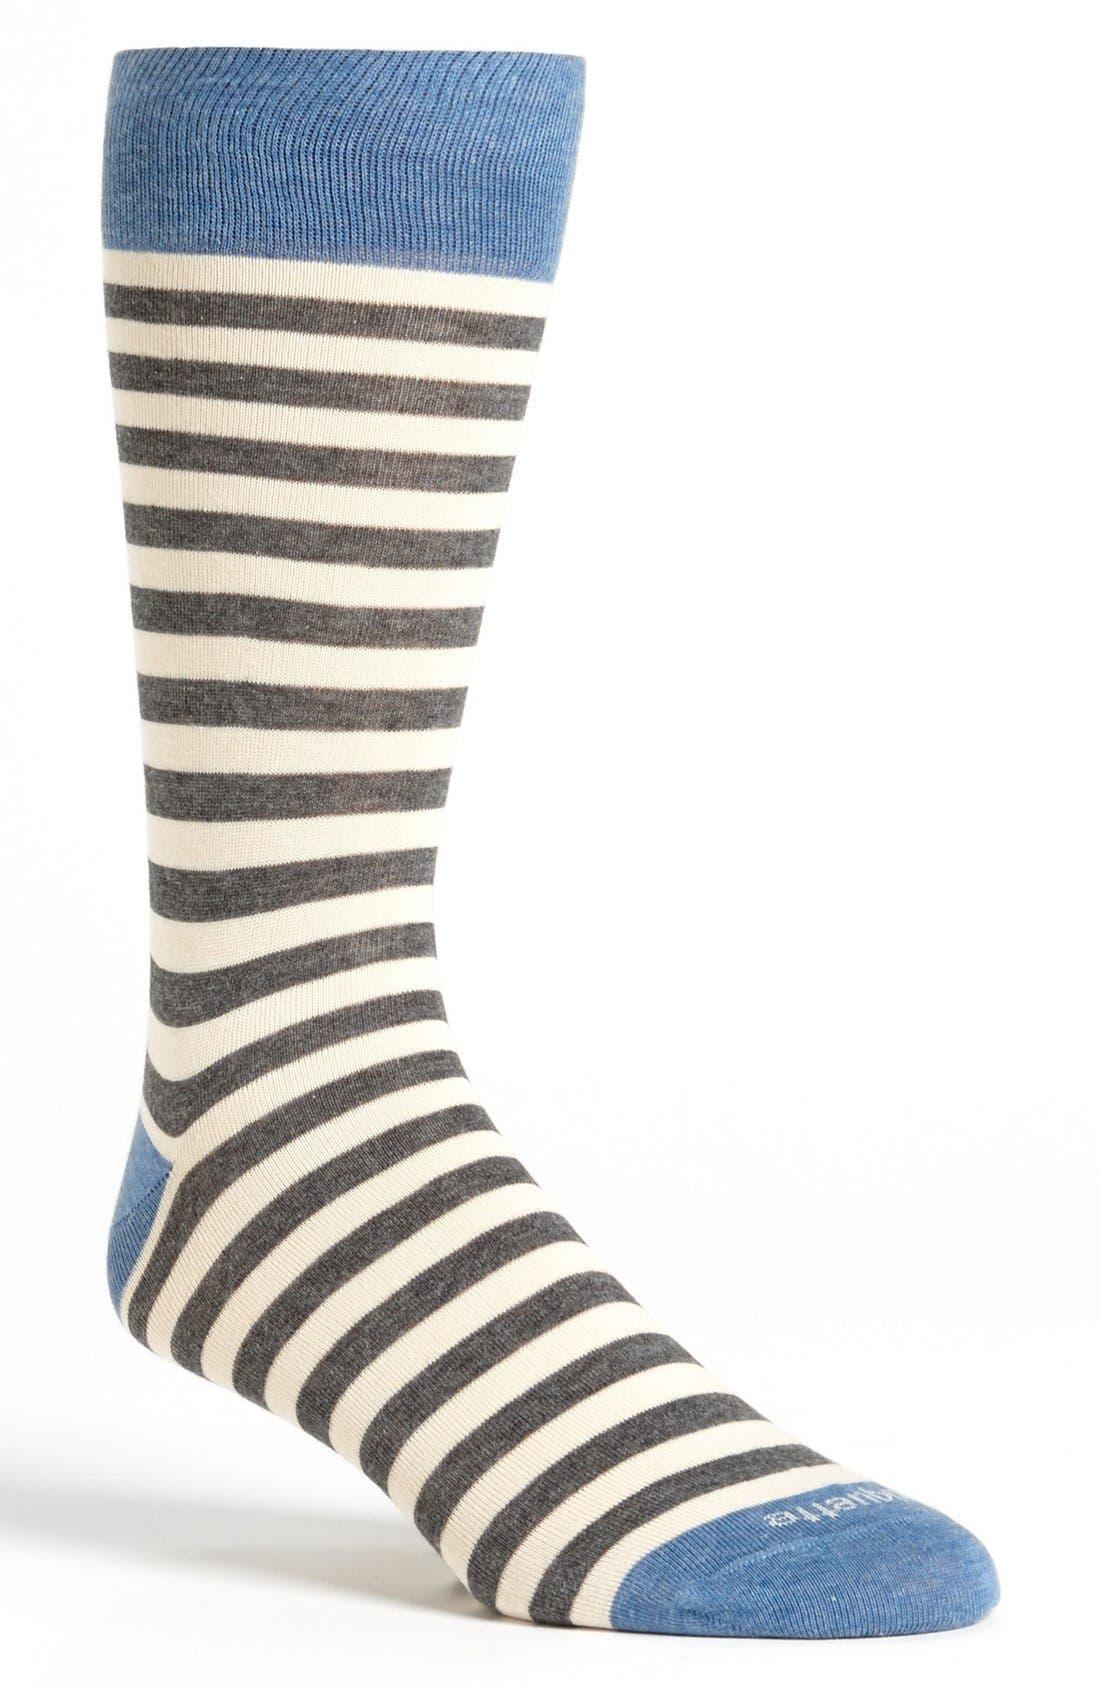 Alternate Image 1 Selected - Etiquette Clothiers Stripe Socks